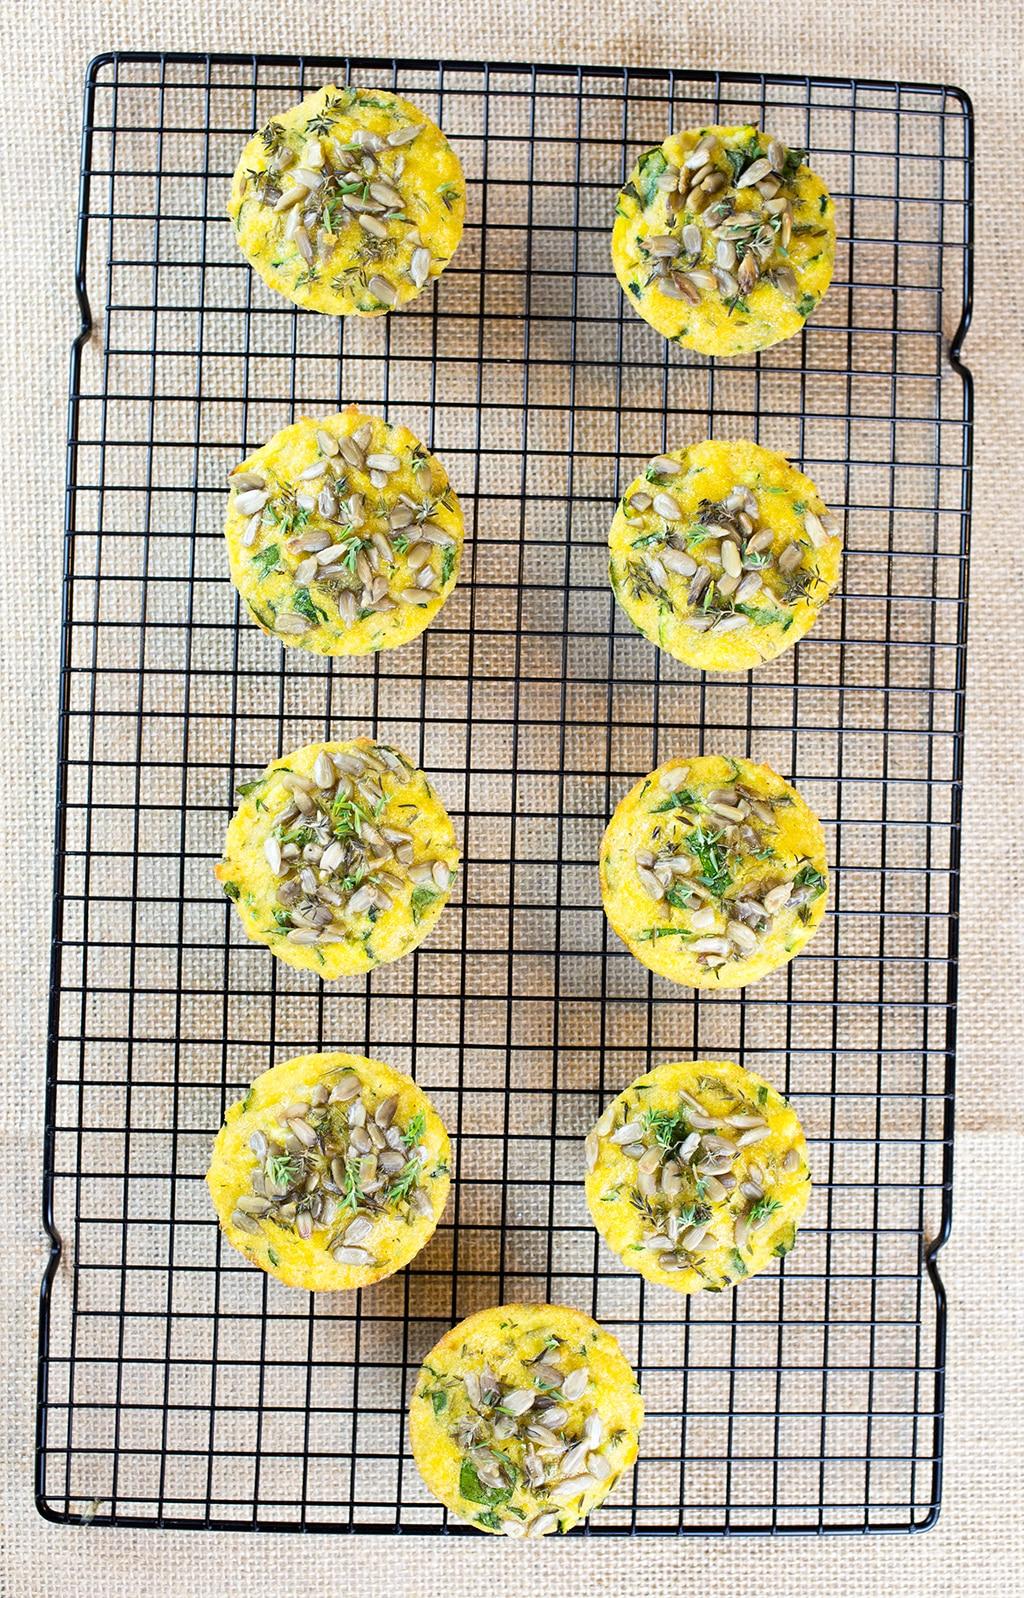 Birdseye view of gluten free savoury muffins on baking tray.